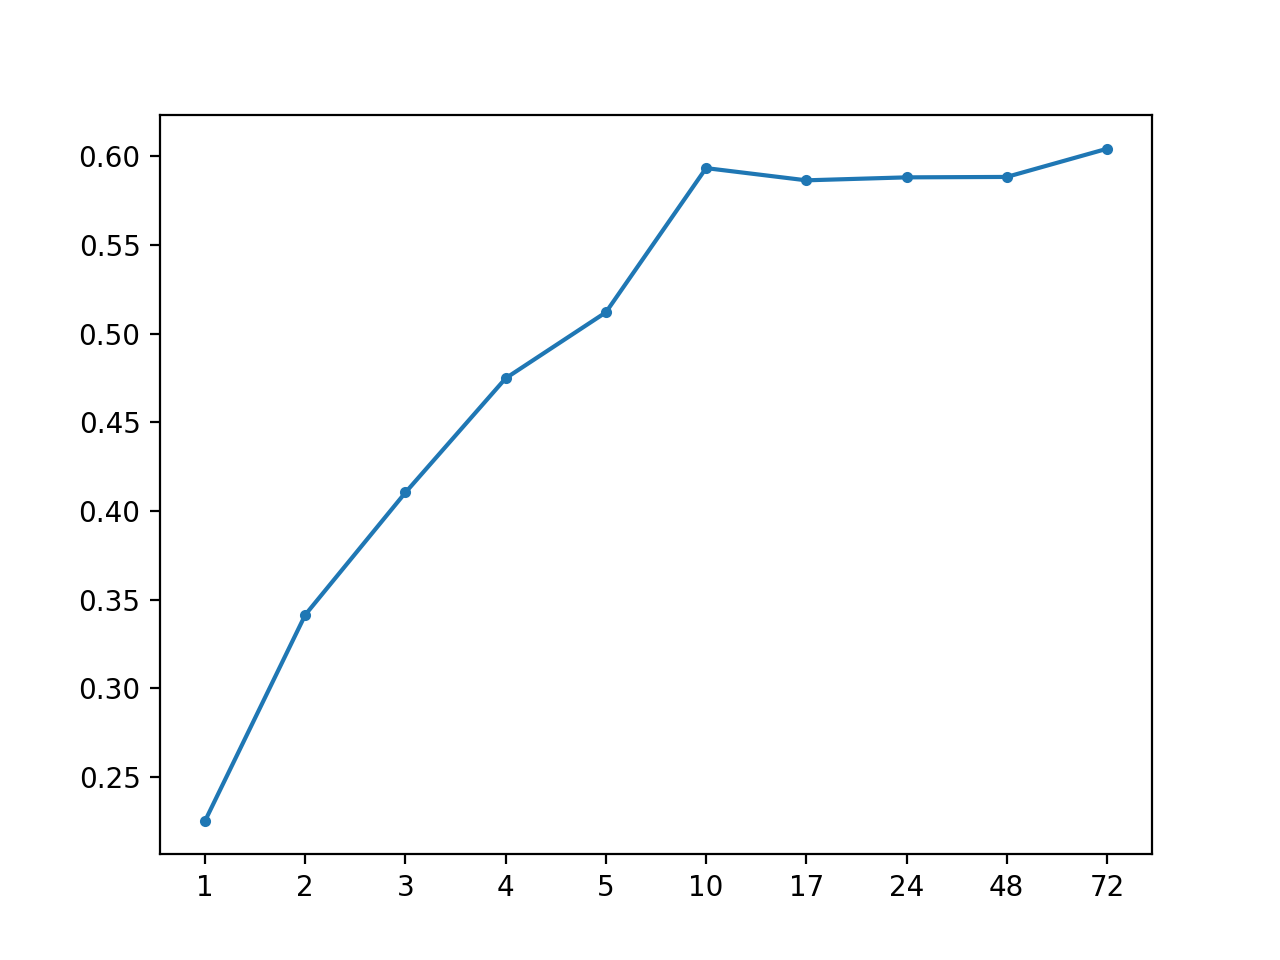 MAE vs Forecast Lead Time for AR(1)